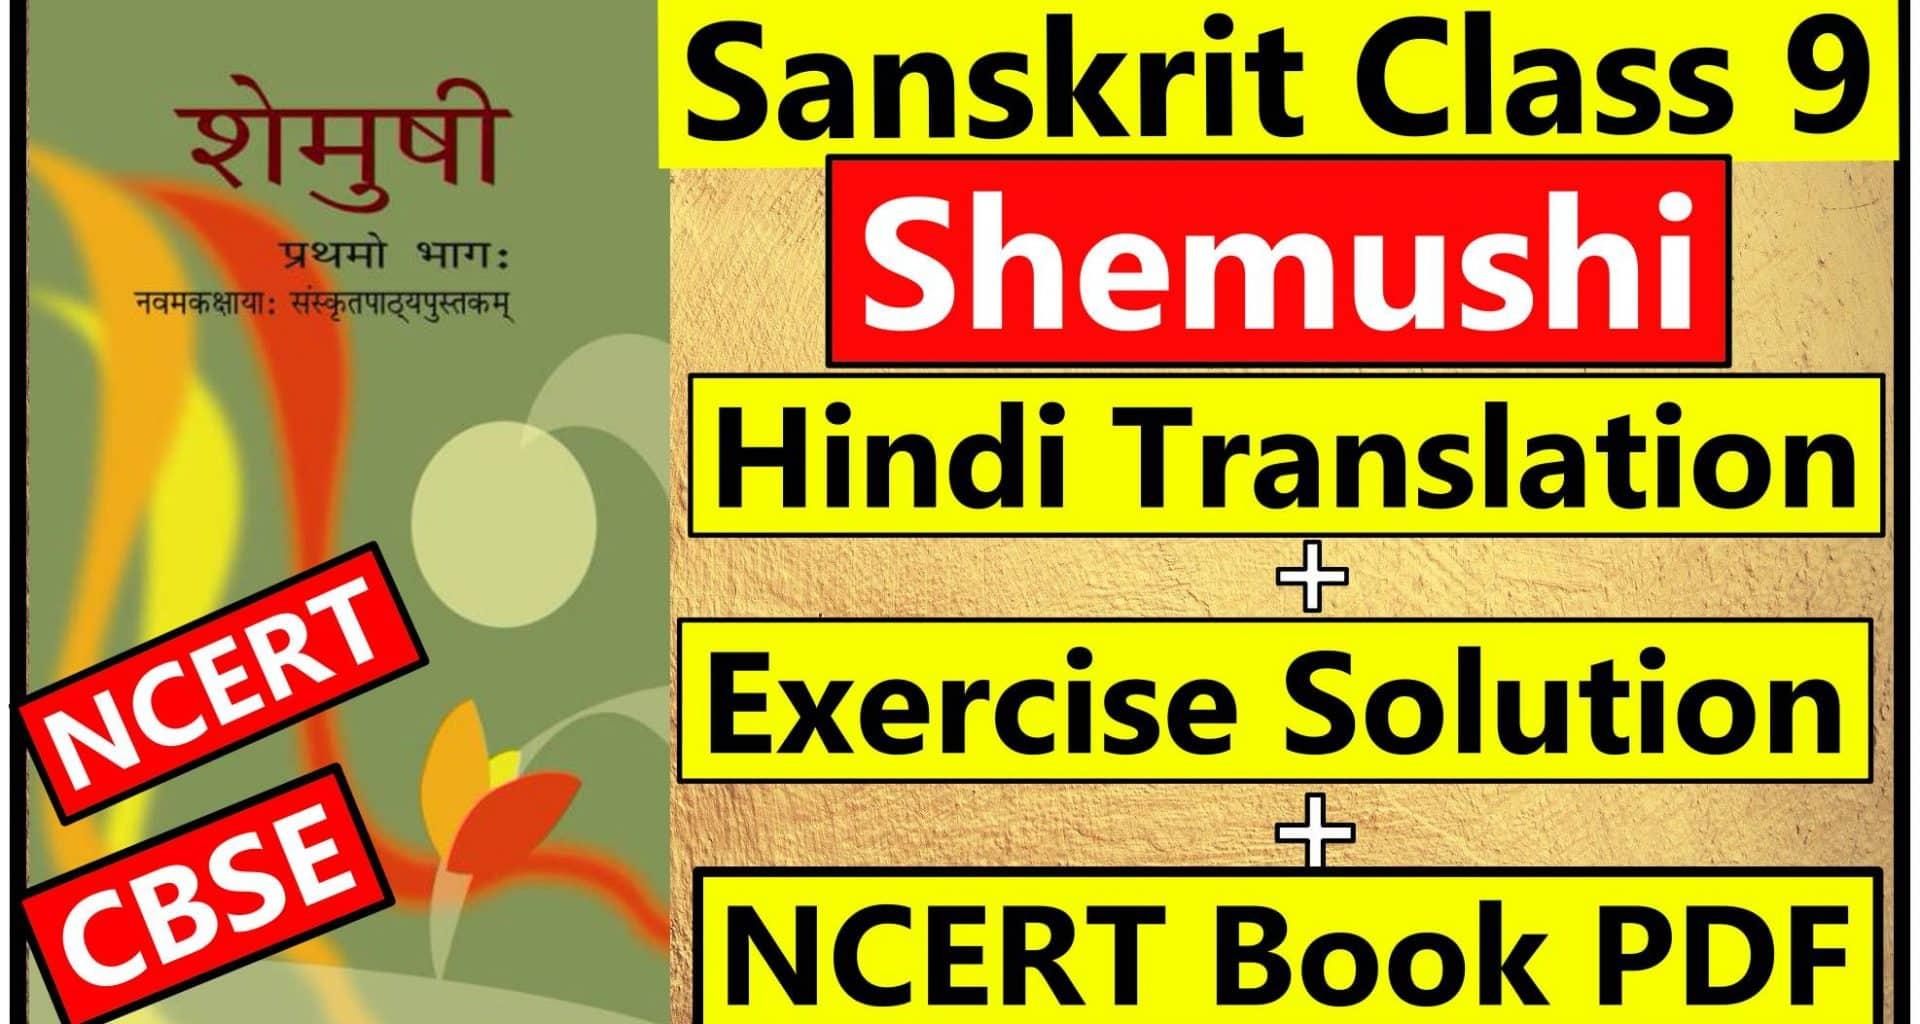 CBSE Sanskrit Class 9 -Shemushi Hindi Translation + Exercise Solution (Question Answer), NCERT Sanskrit Book Shemushi view or download.